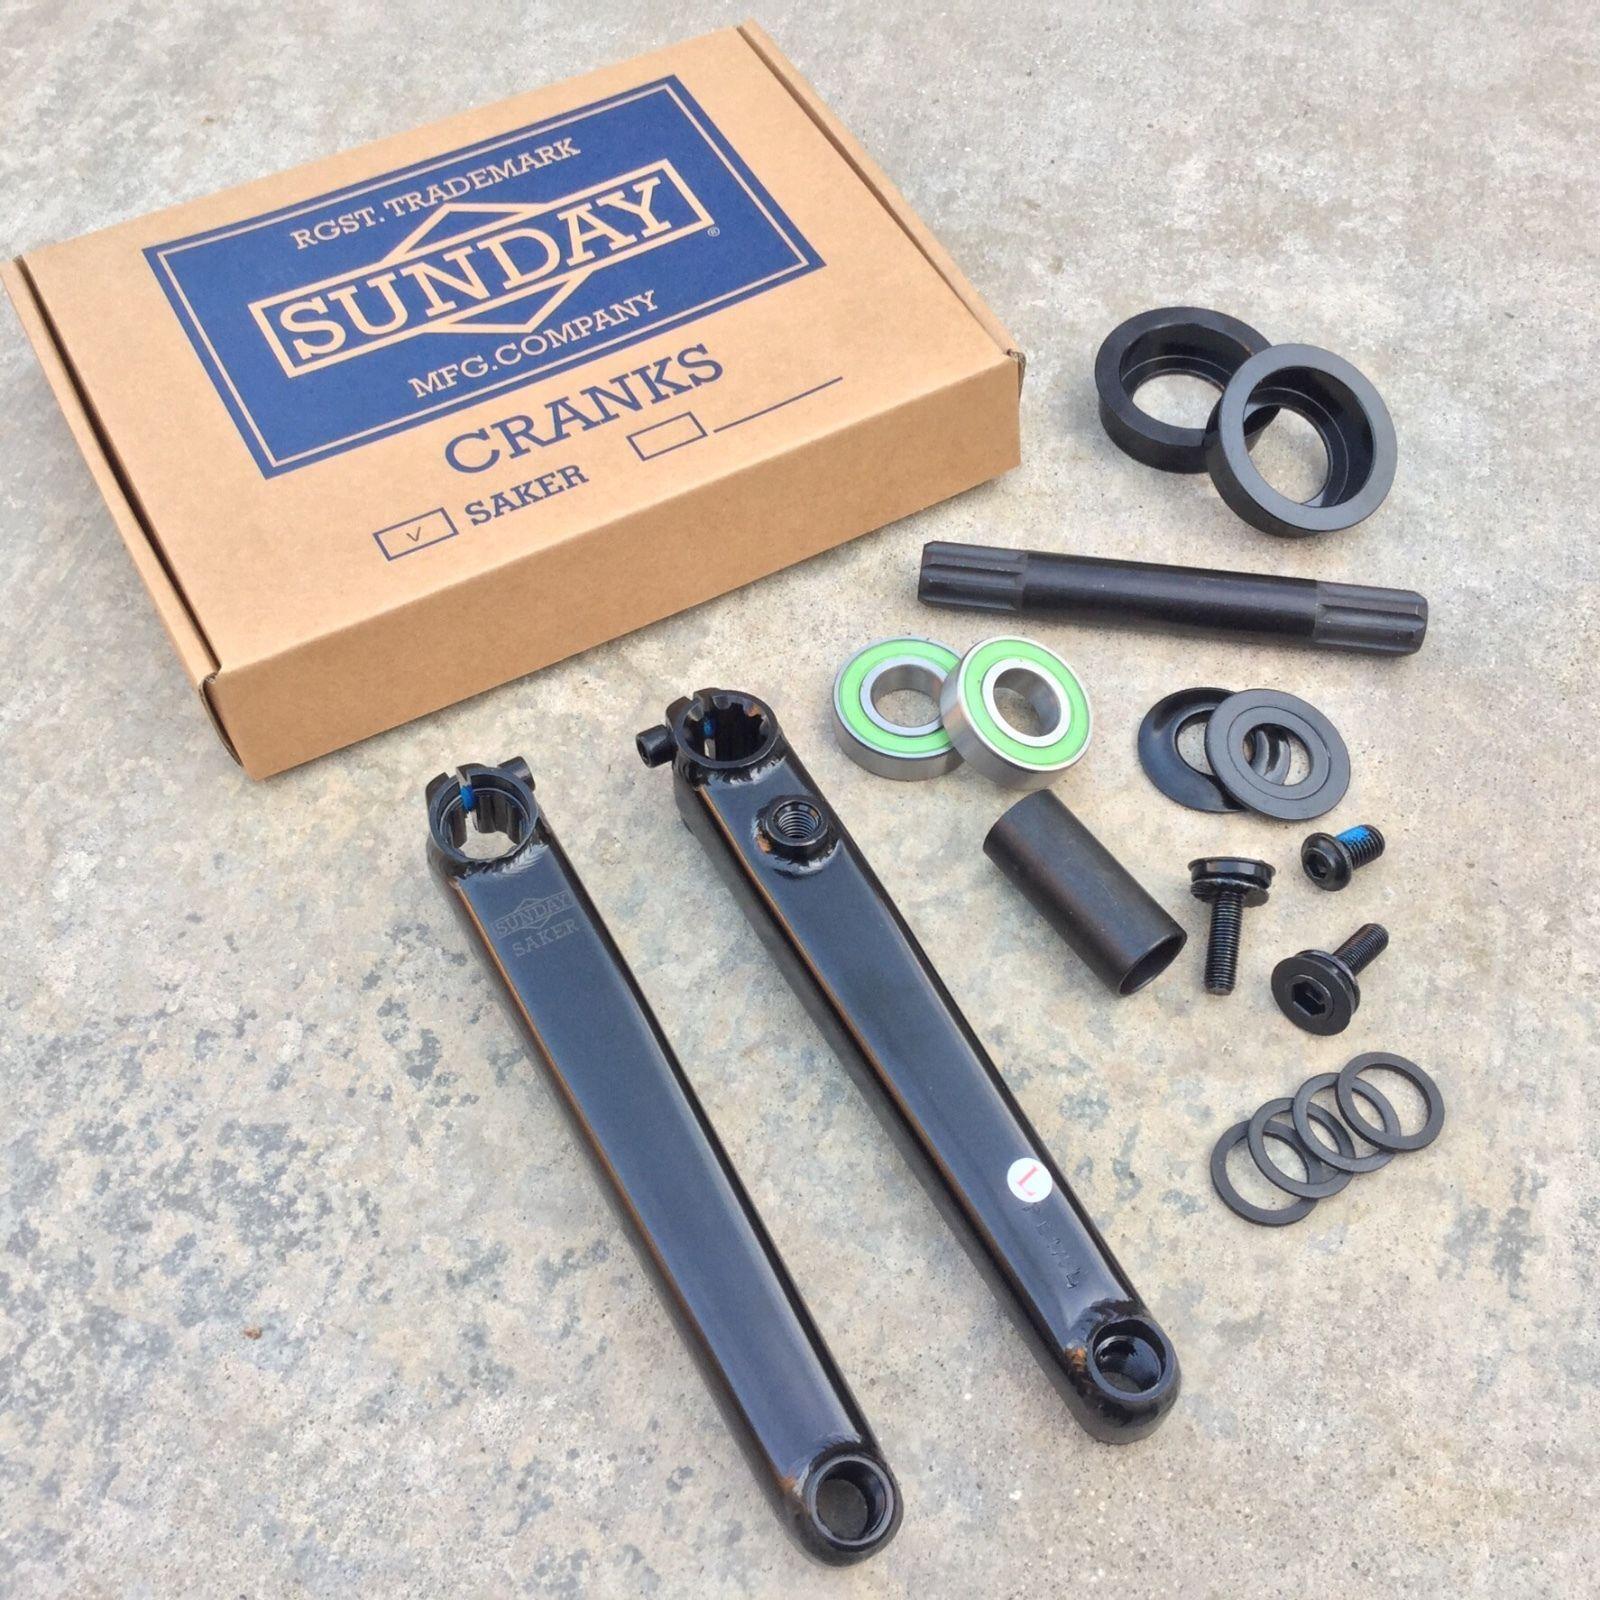 Sunday Saker V2 BMX Bike Cranks Black w Logo 165mm 3 Piece BMX Crankset